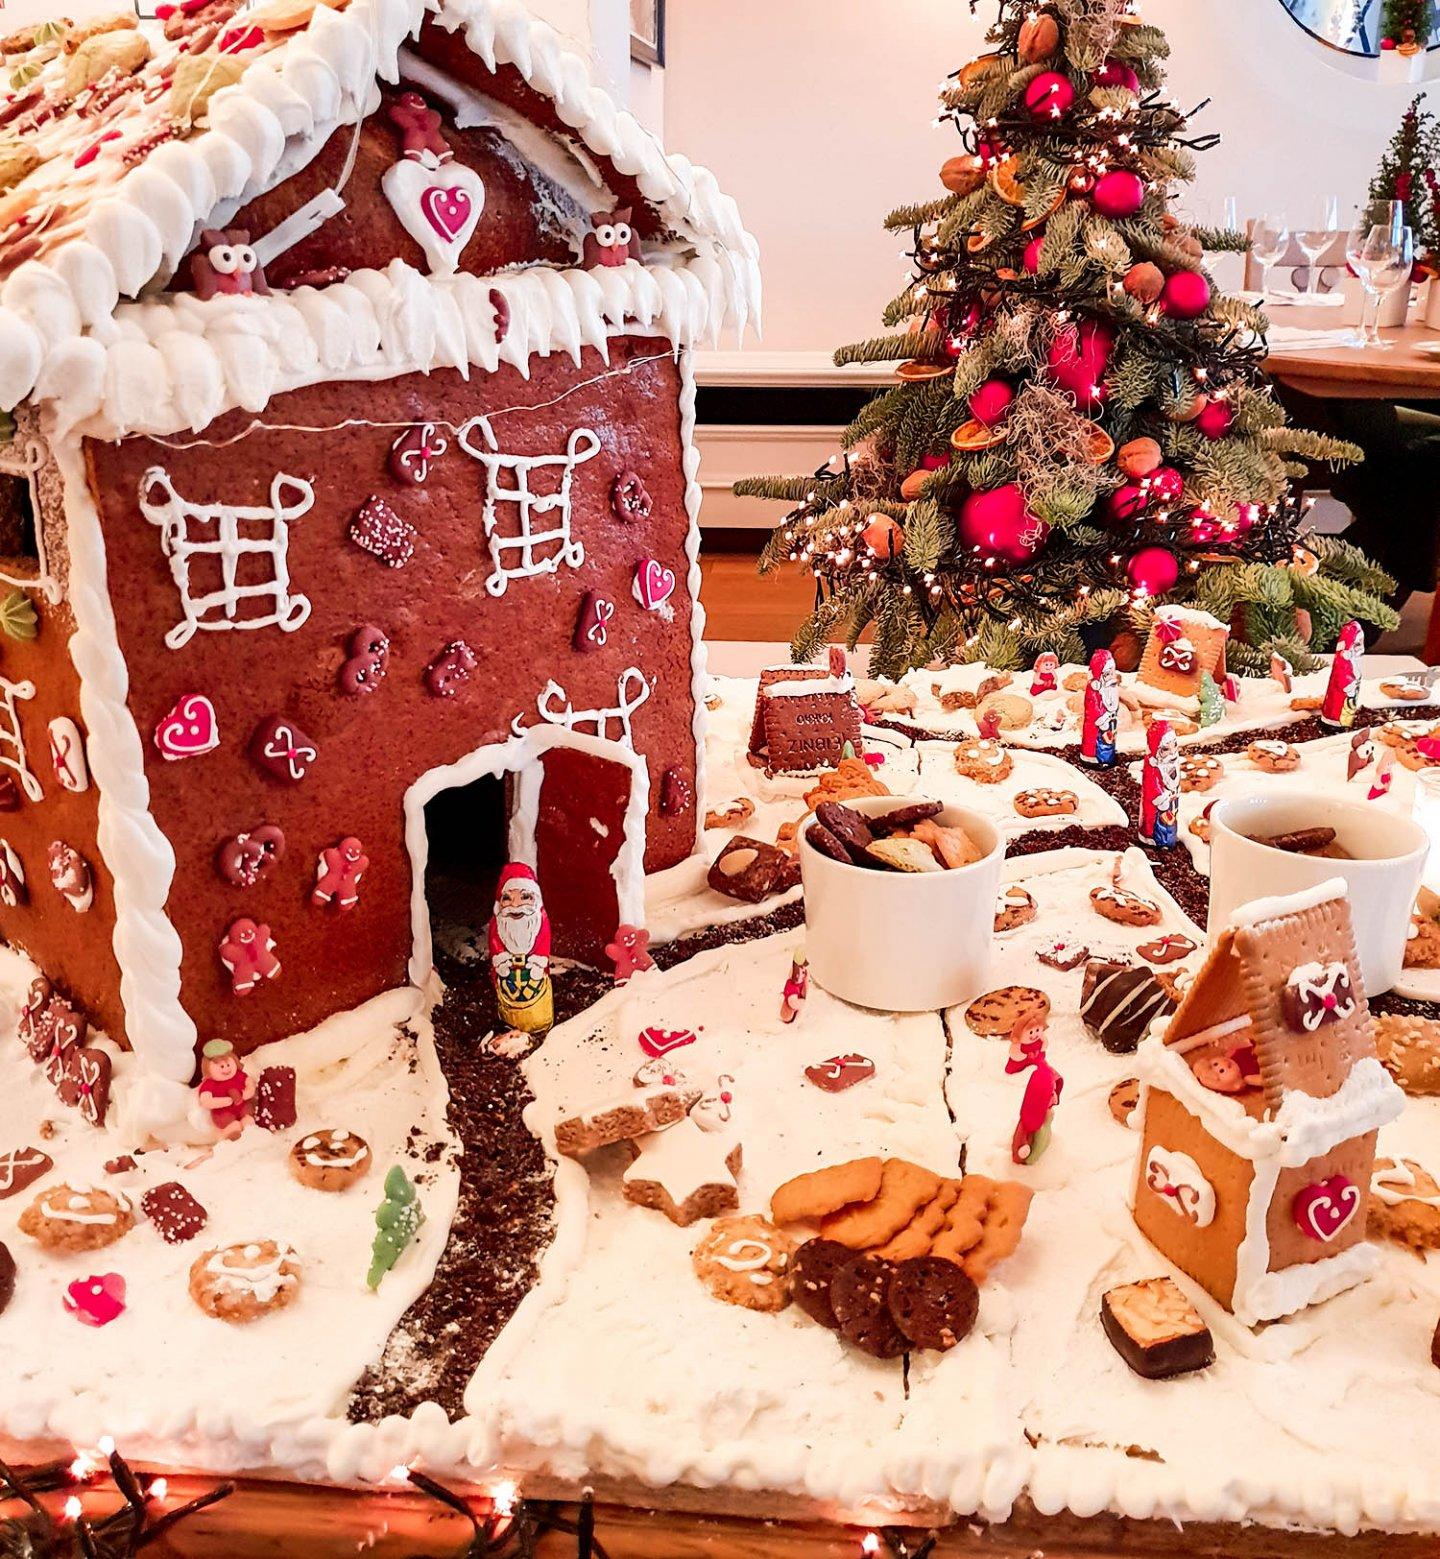 Merry-Christmas-Frohe-Weihnachten-Lebkuchenhaus-Kationette